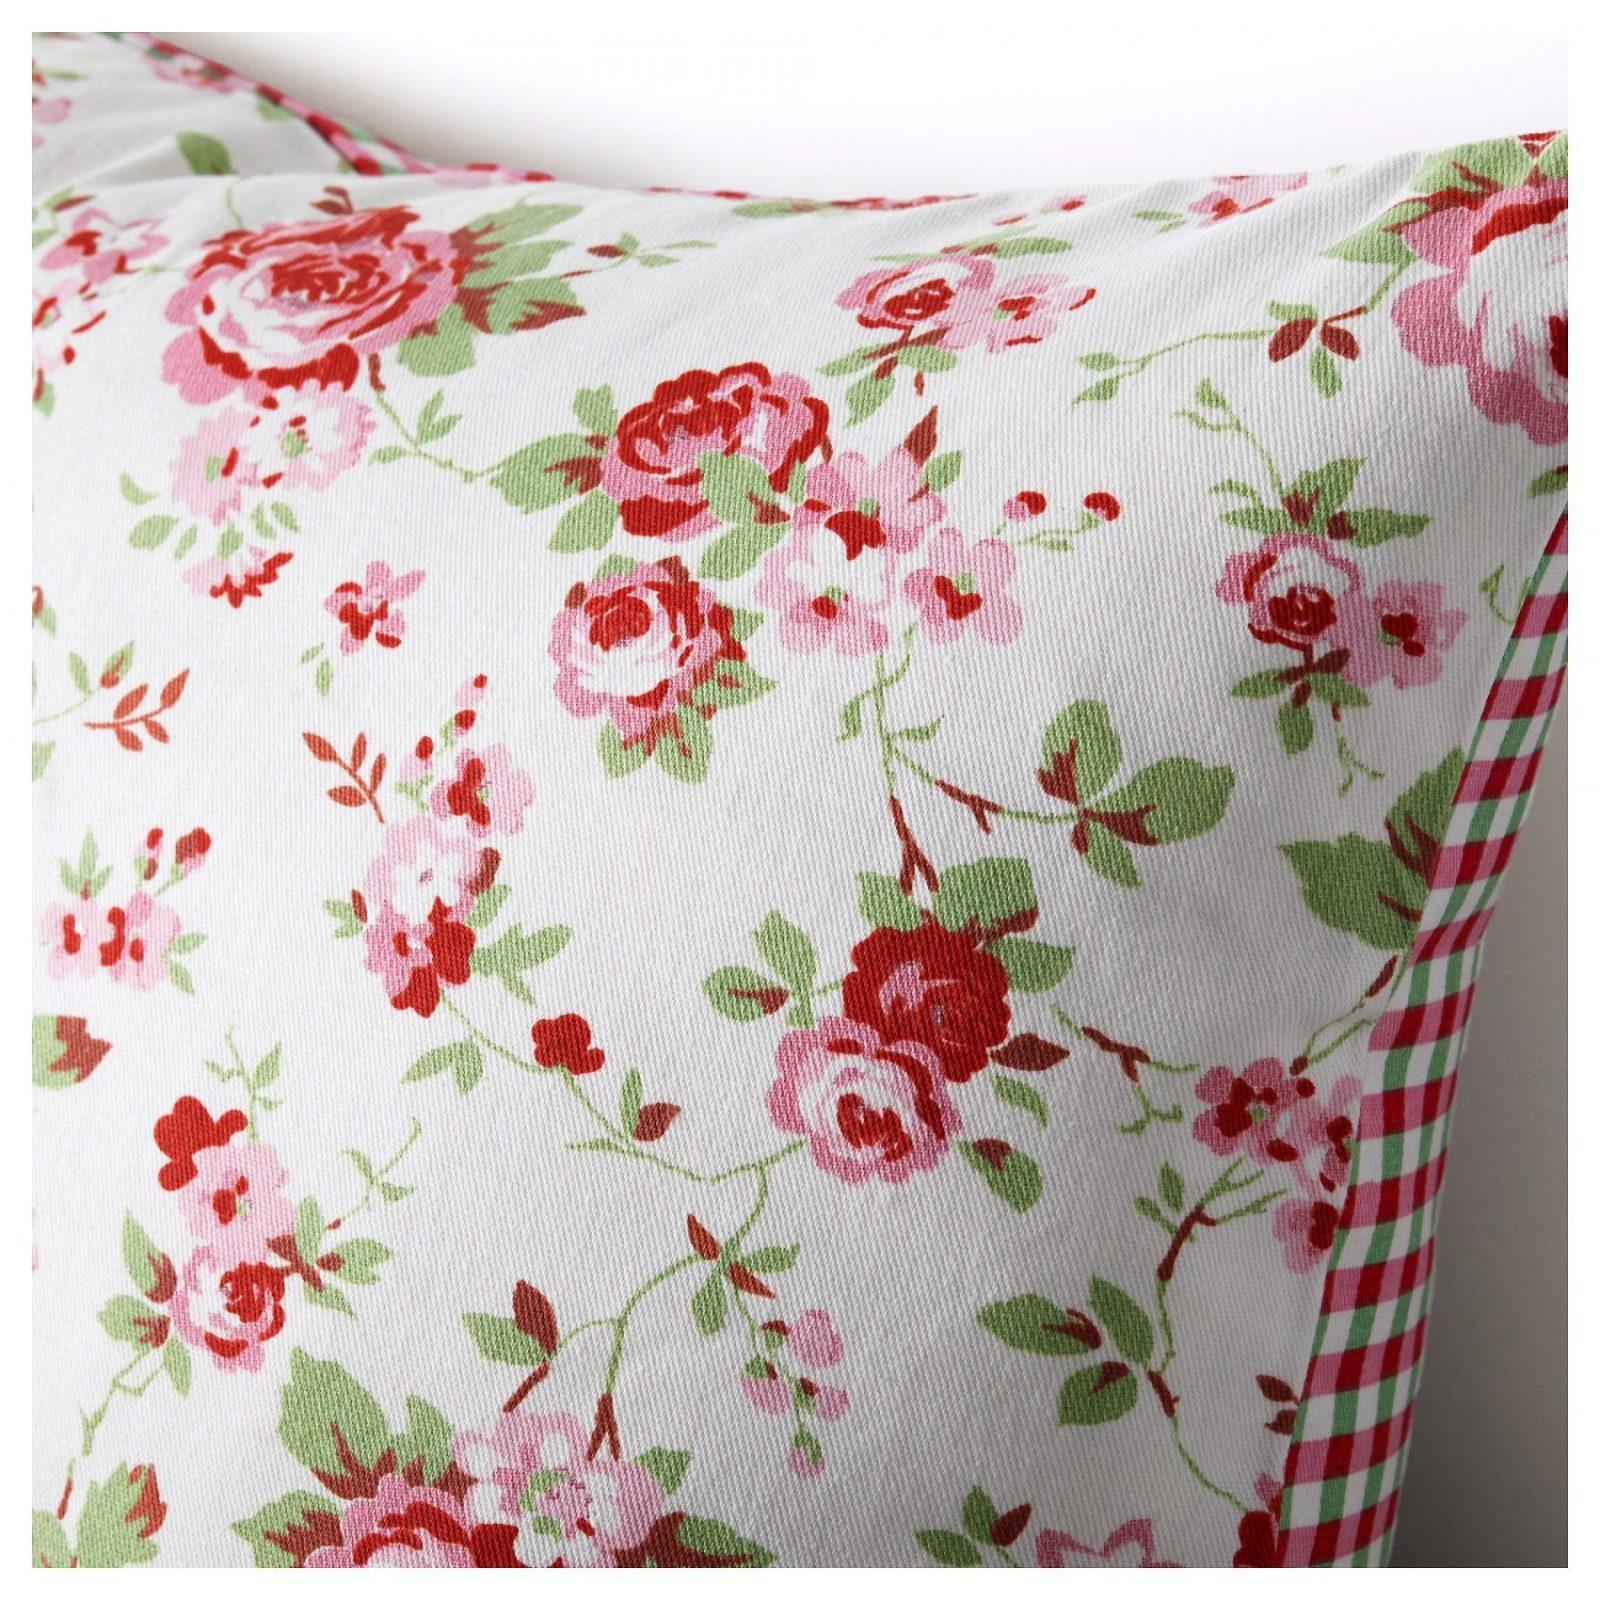 ikea bettw sche rosali haus design ideen. Black Bedroom Furniture Sets. Home Design Ideas